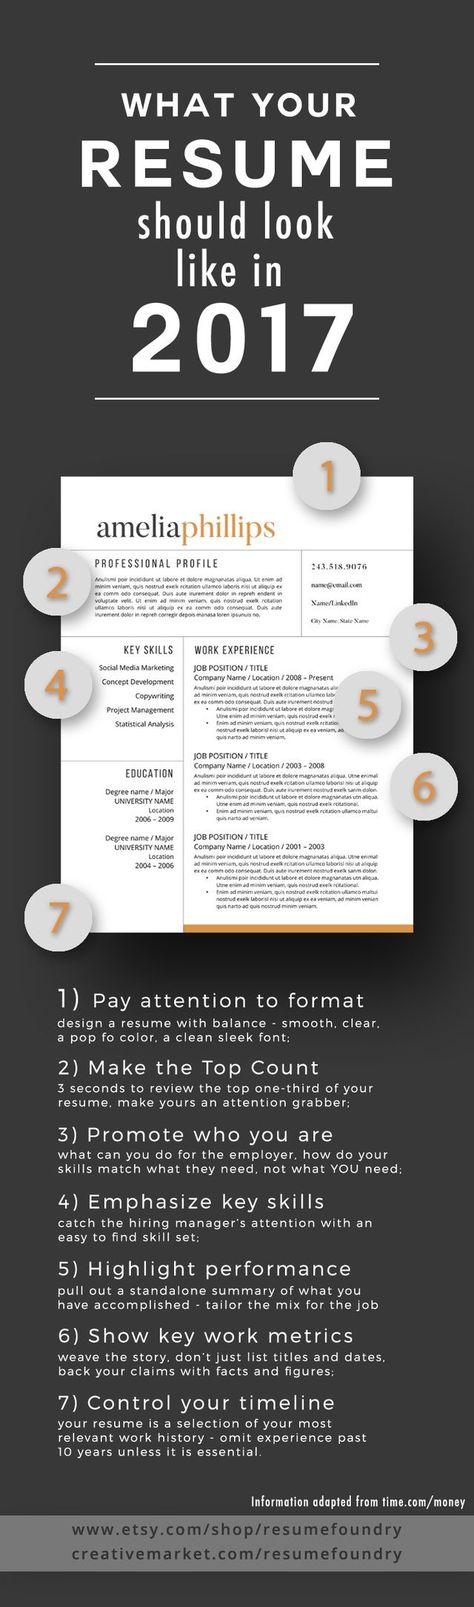 resume accountant%0A sample resume australian format best australia resumes templates accounting  for senior template download   Home Design Idea   Pinterest   Interiors